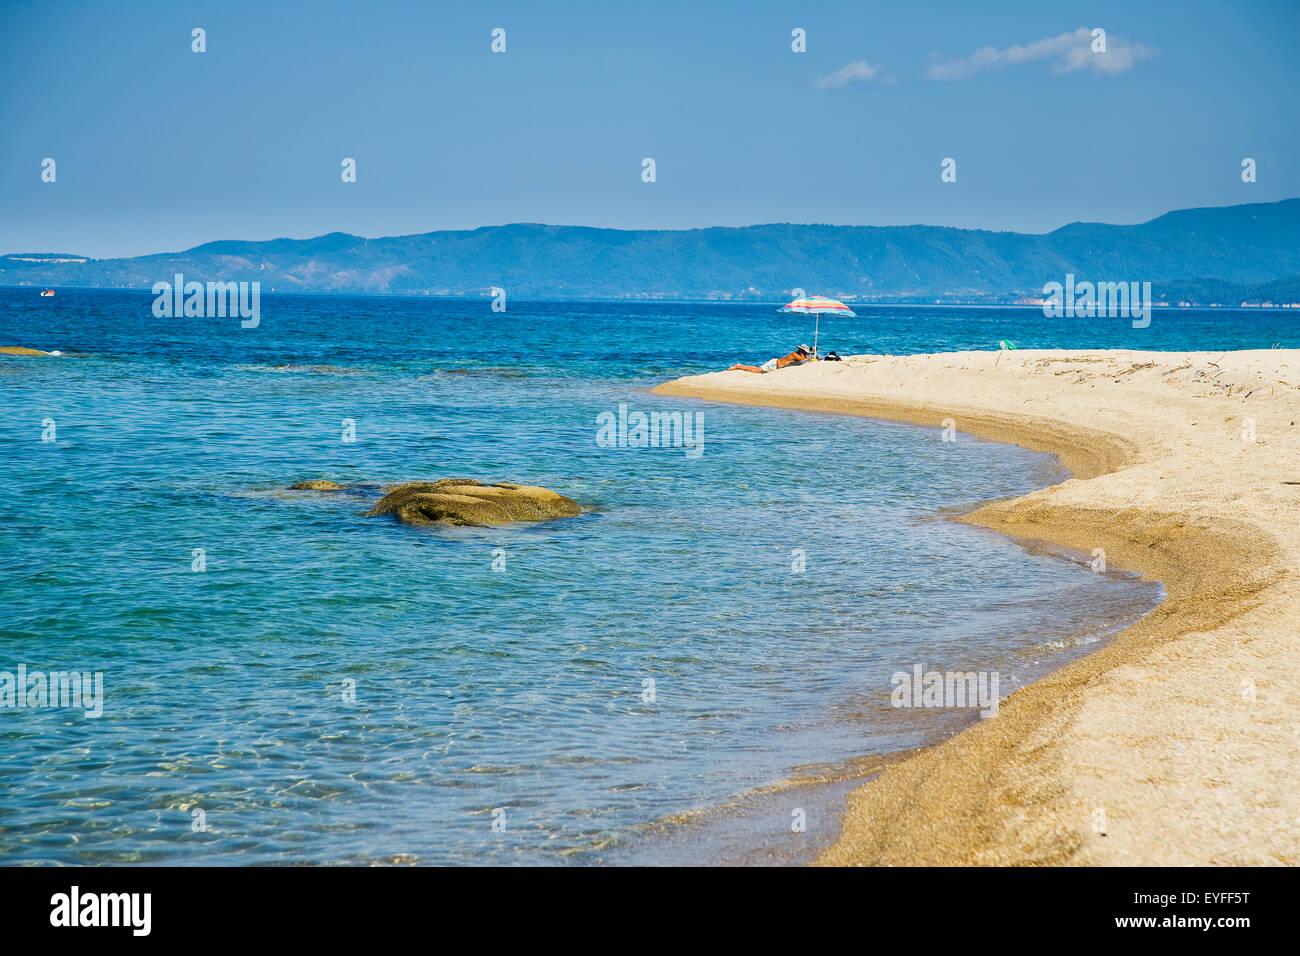 Greece, Halkidiki, Solitary sunbather lying under a beach parasol; Ierissos - Stock Image